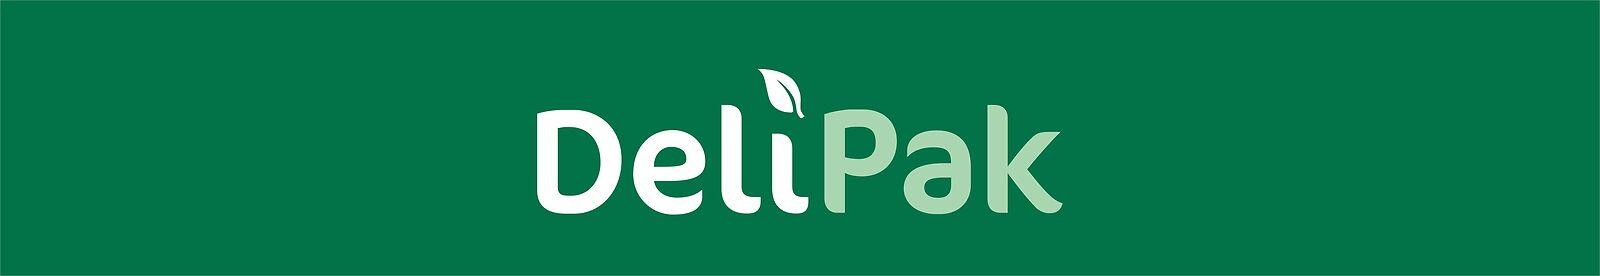 Delipak